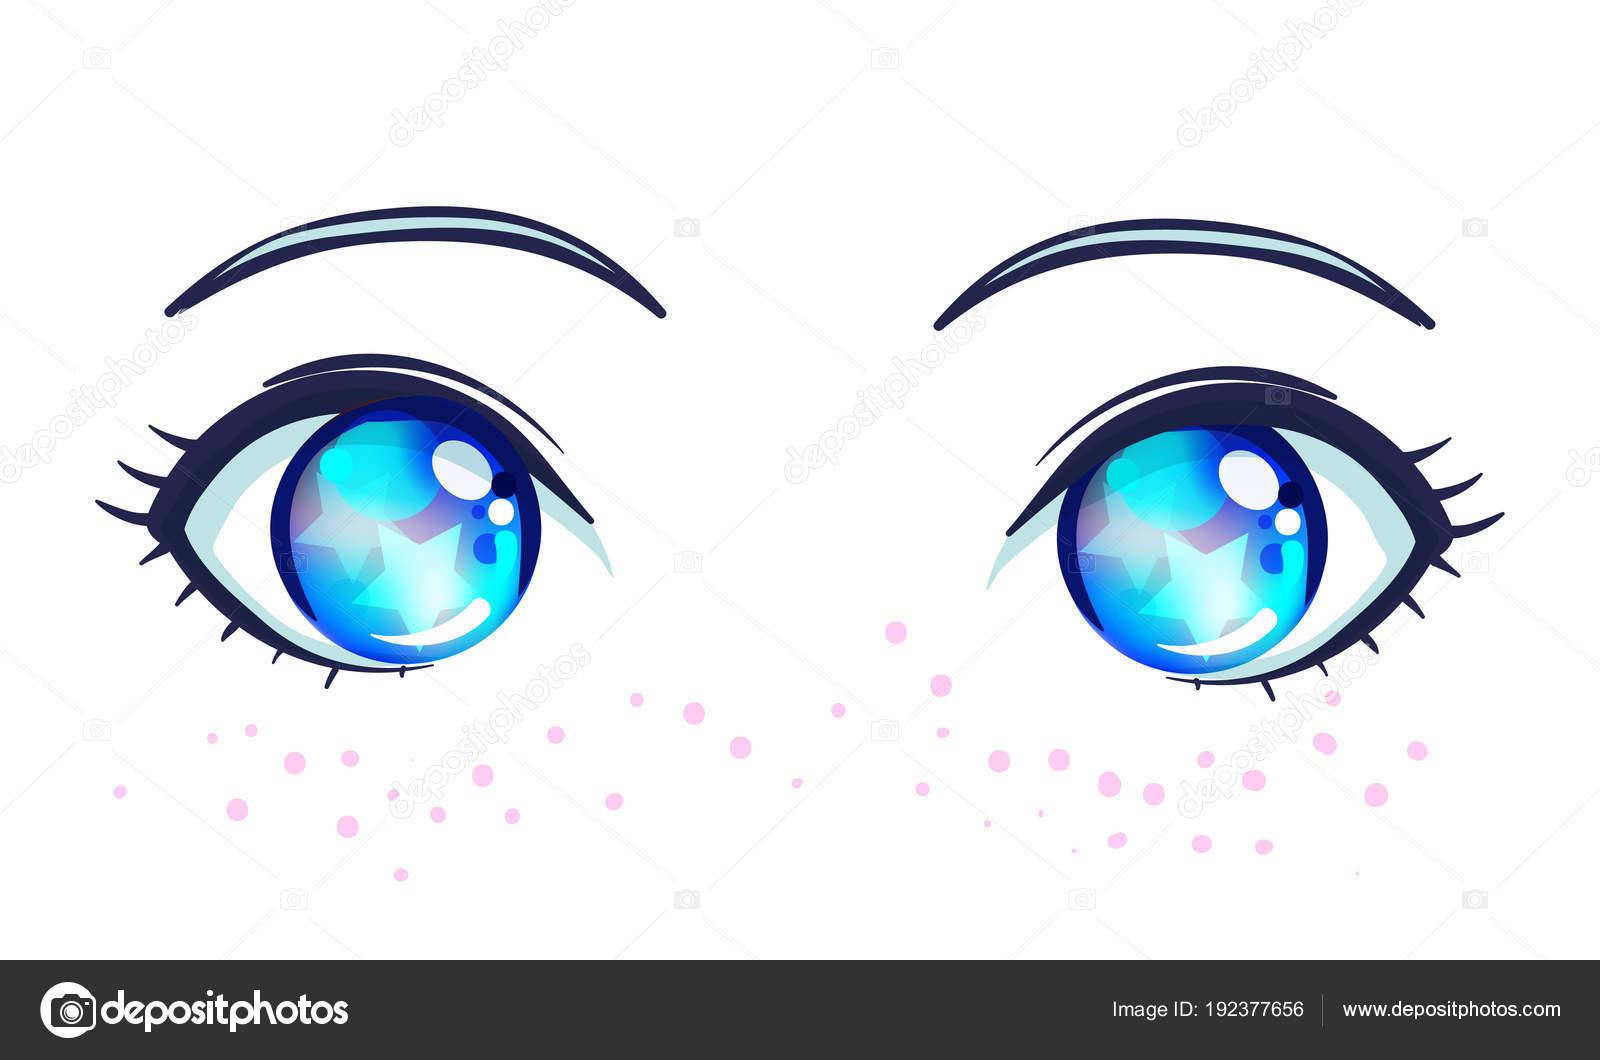 5 232 Anime Eyes Vectors Royalty Free Vector Anime Eyes Images Depositphotos